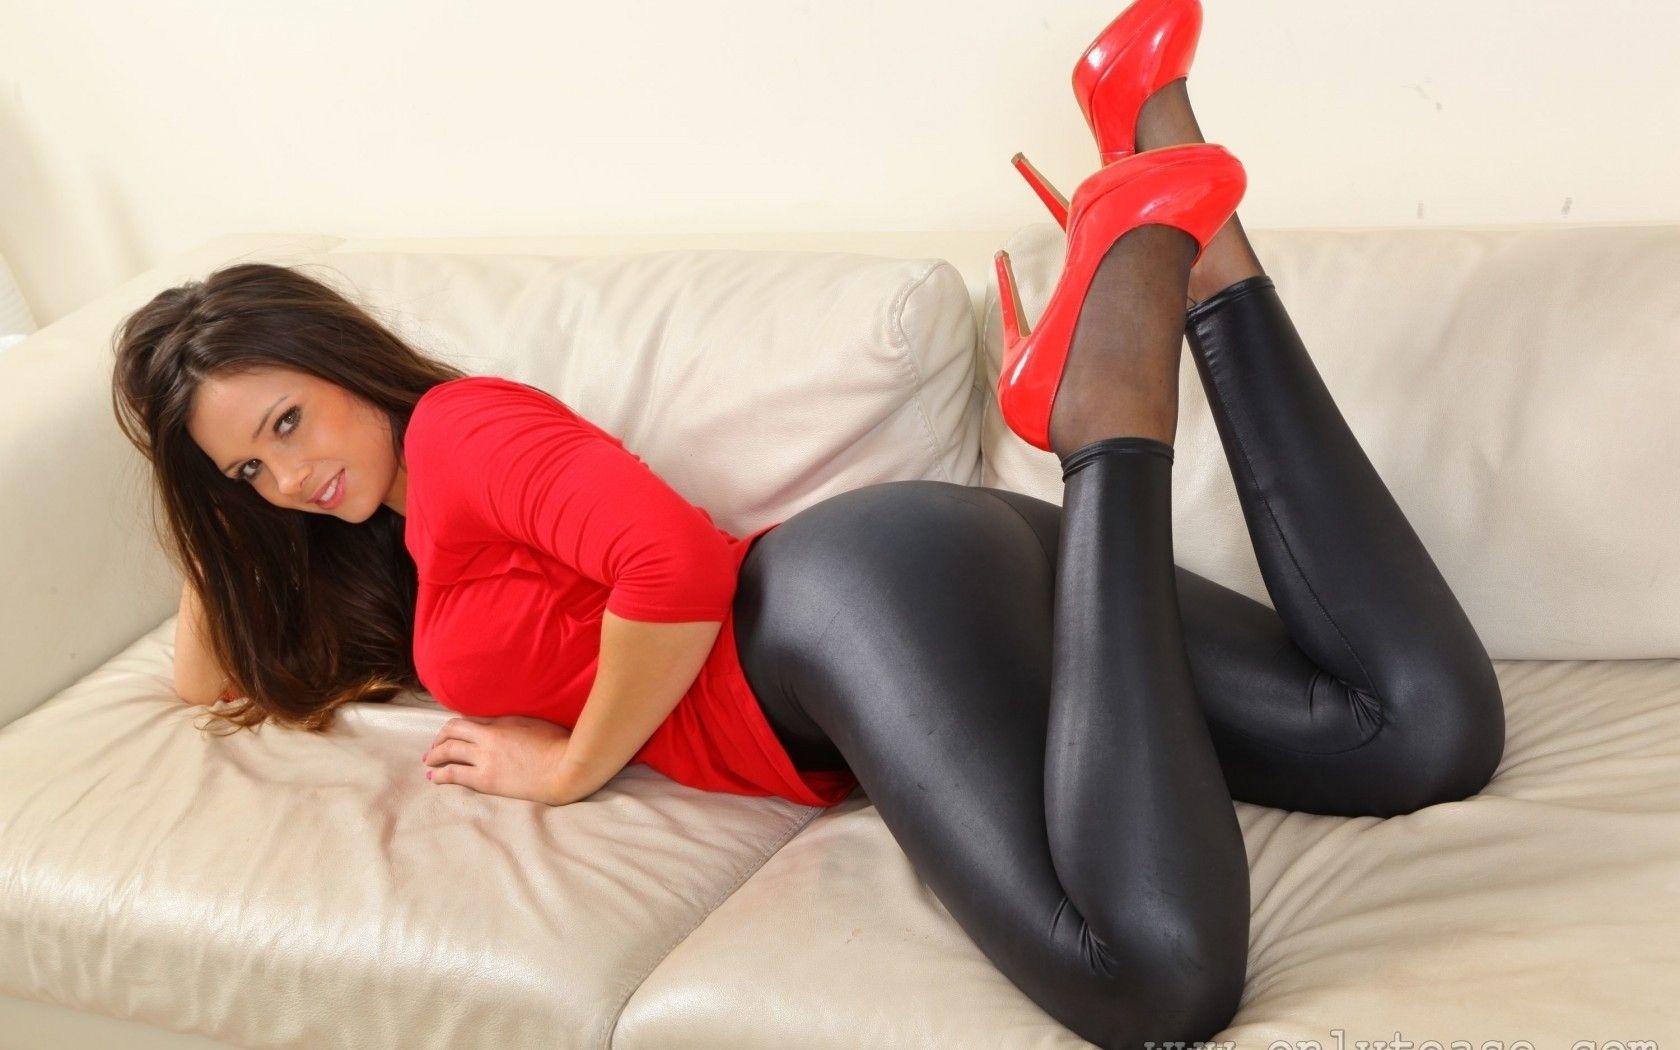 207b876b016 Louisa Marie Wallpaper | Models high heels Louisa Marie HD Wallpaper ...